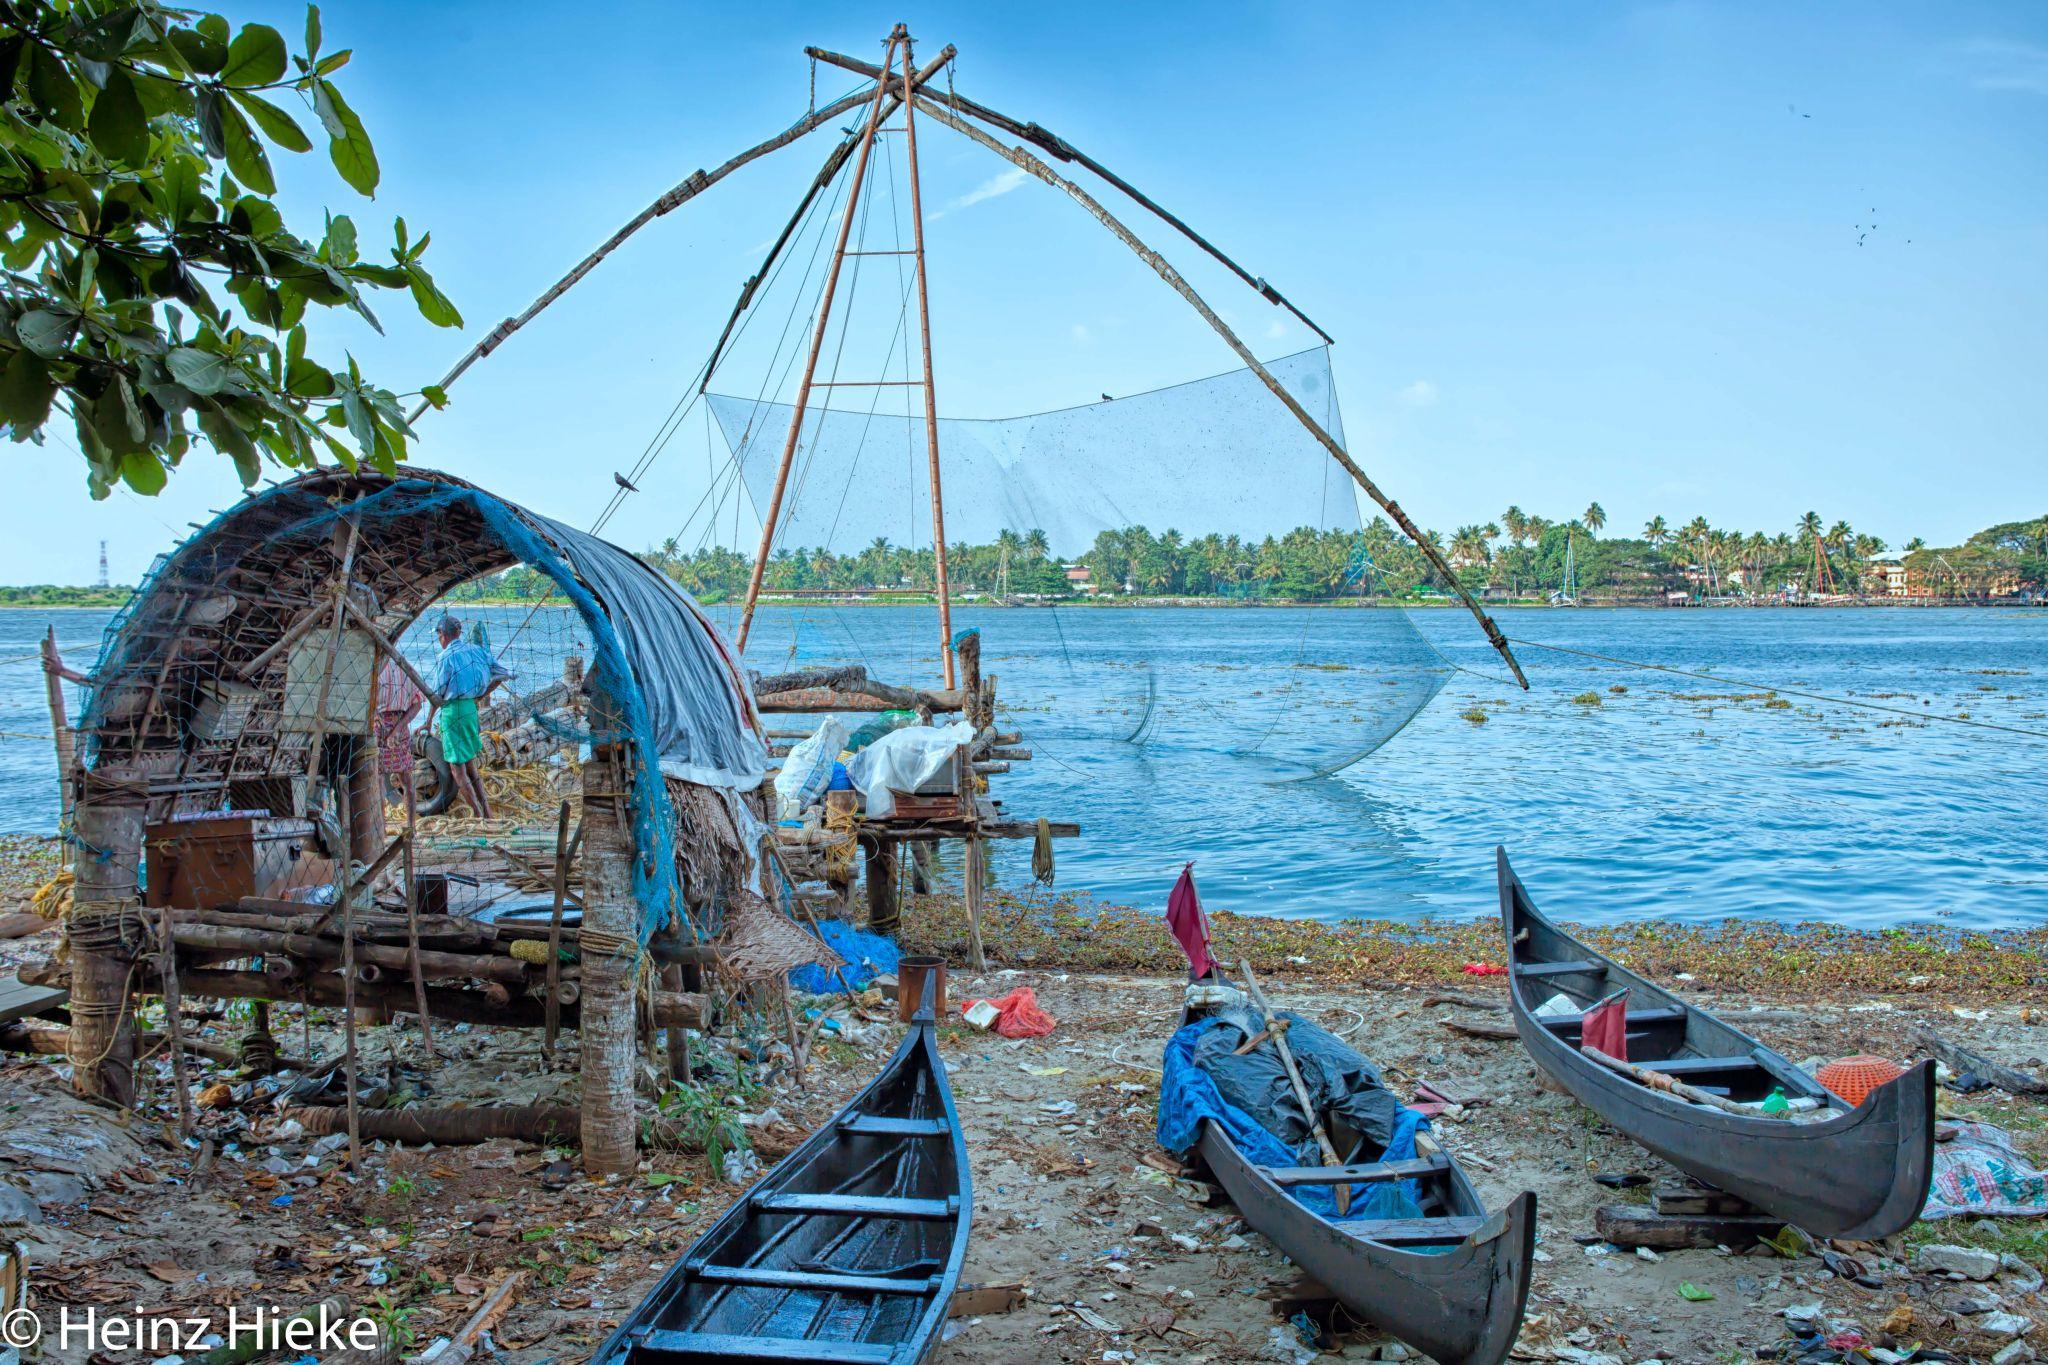 Chinese Fishing Nets, India